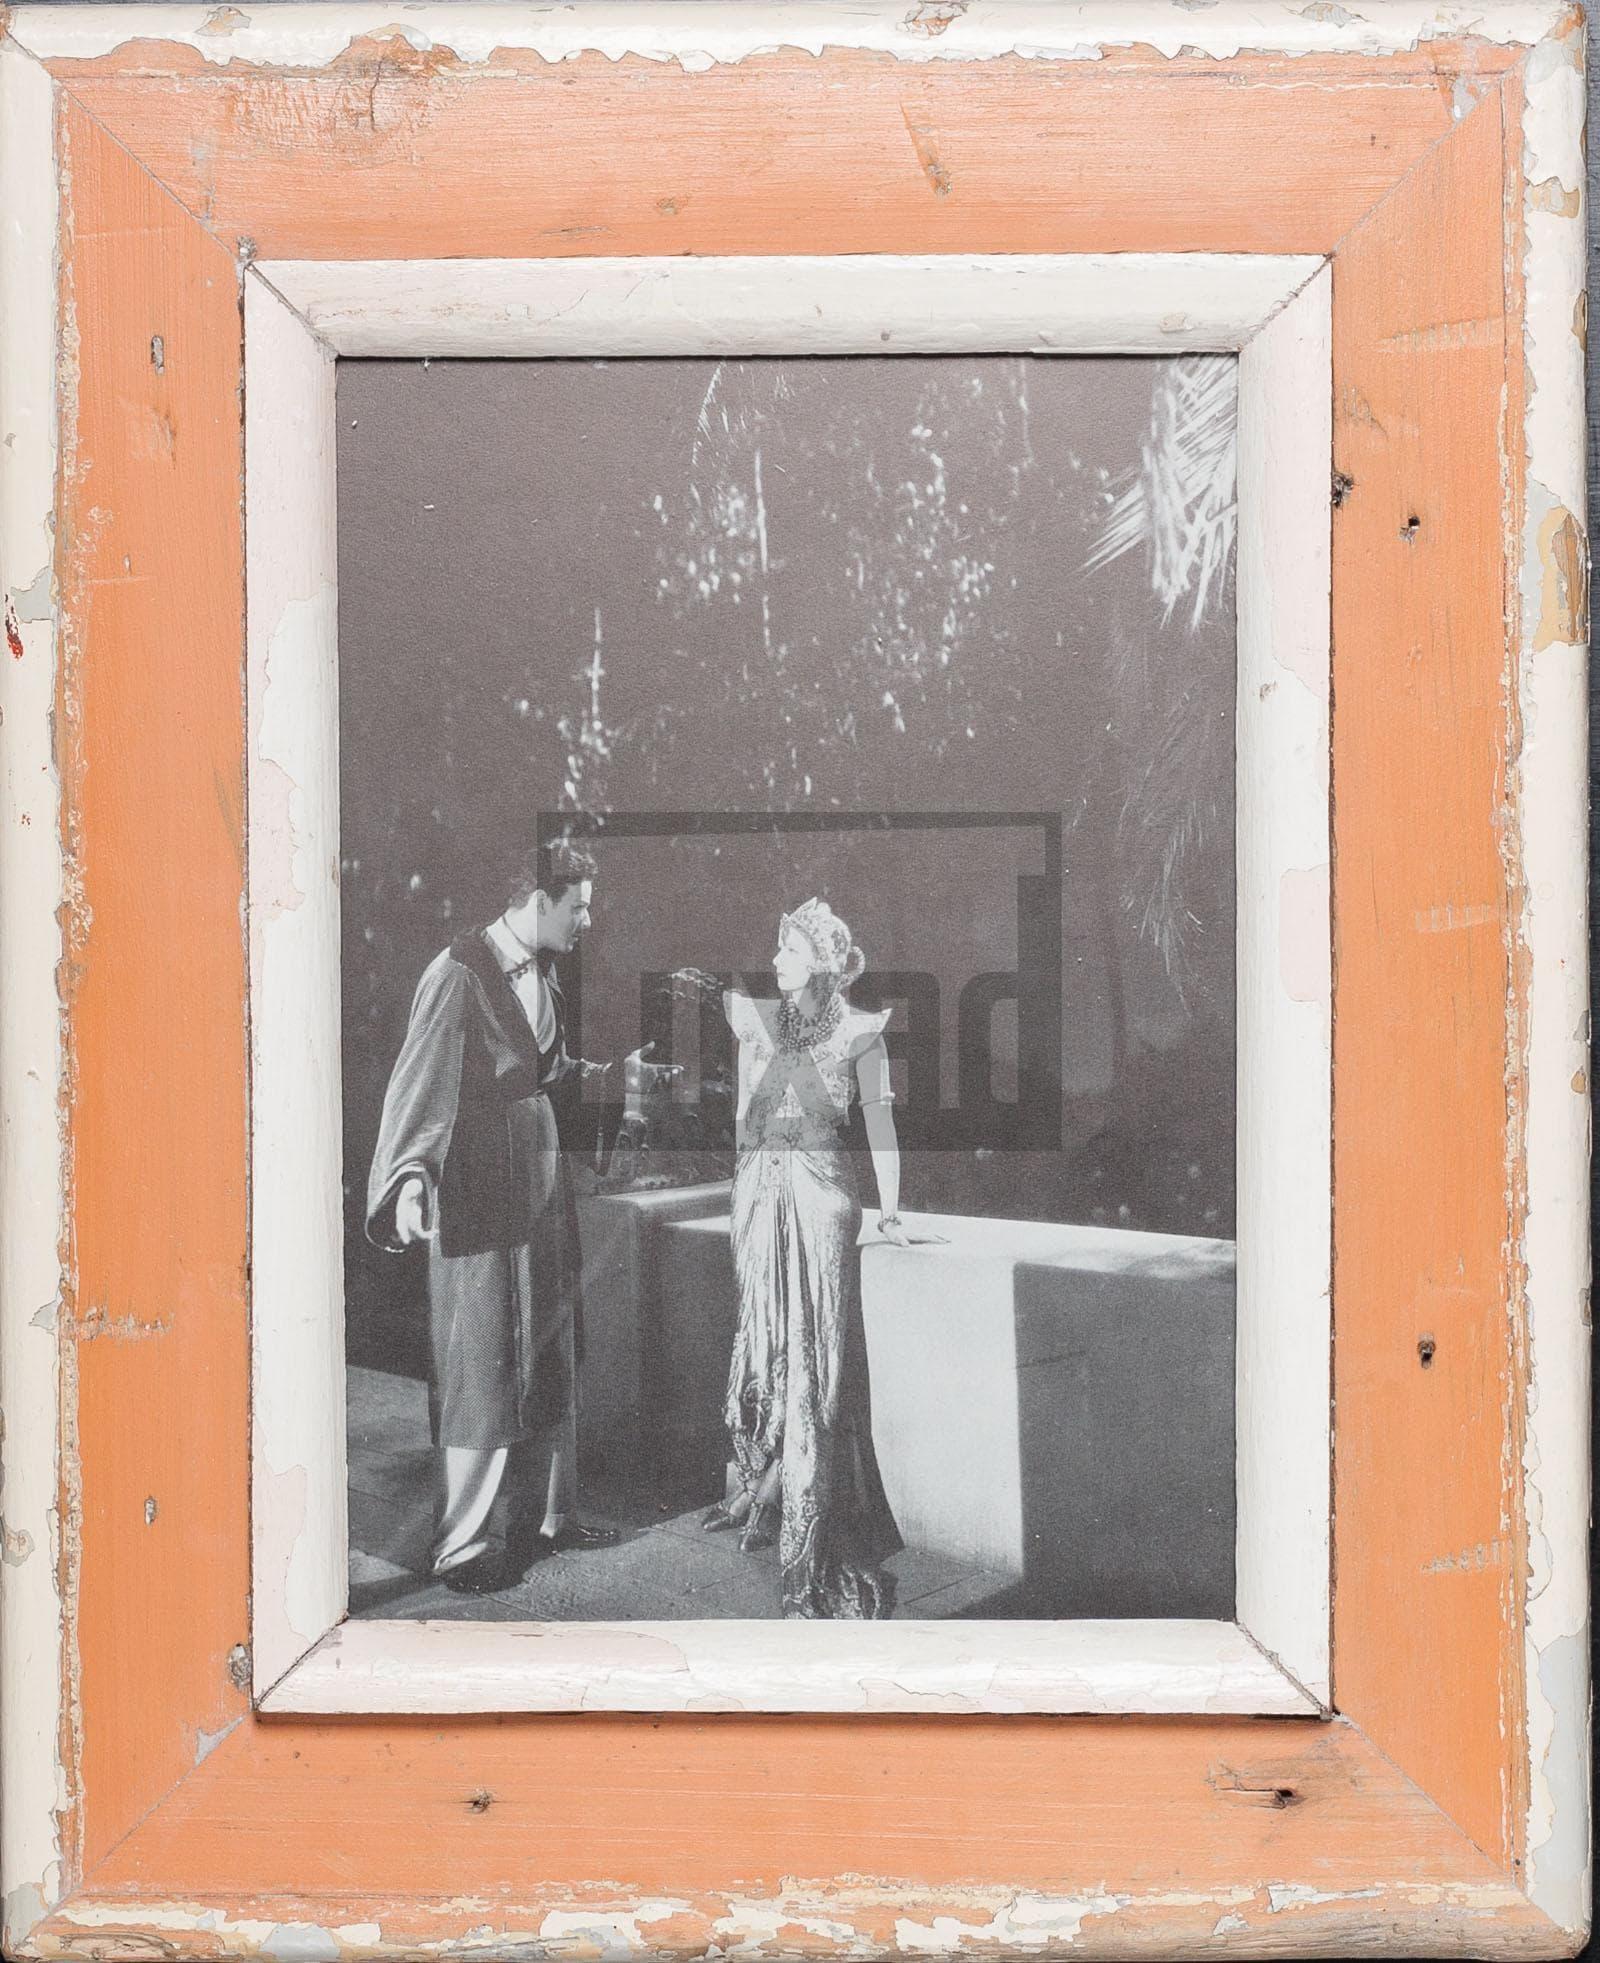 Vintage-Bilderrahmen